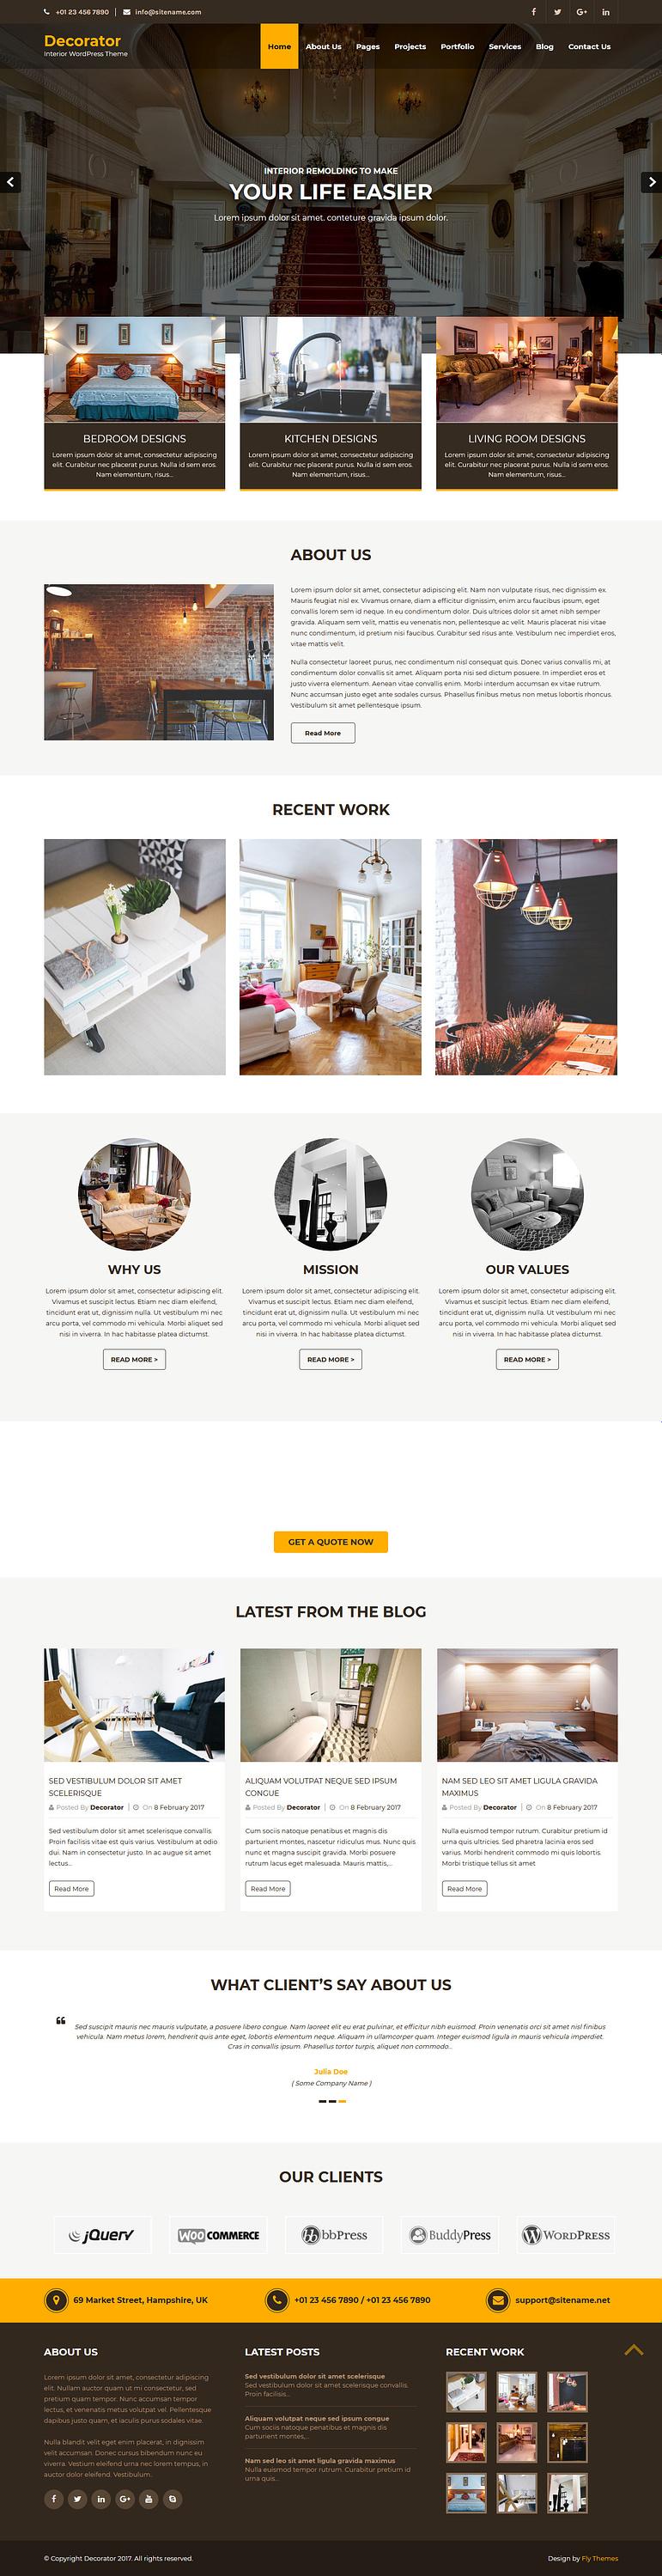 decorator best free architecture wordpress theme - 10+ Best Free Architecture WordPress Themes